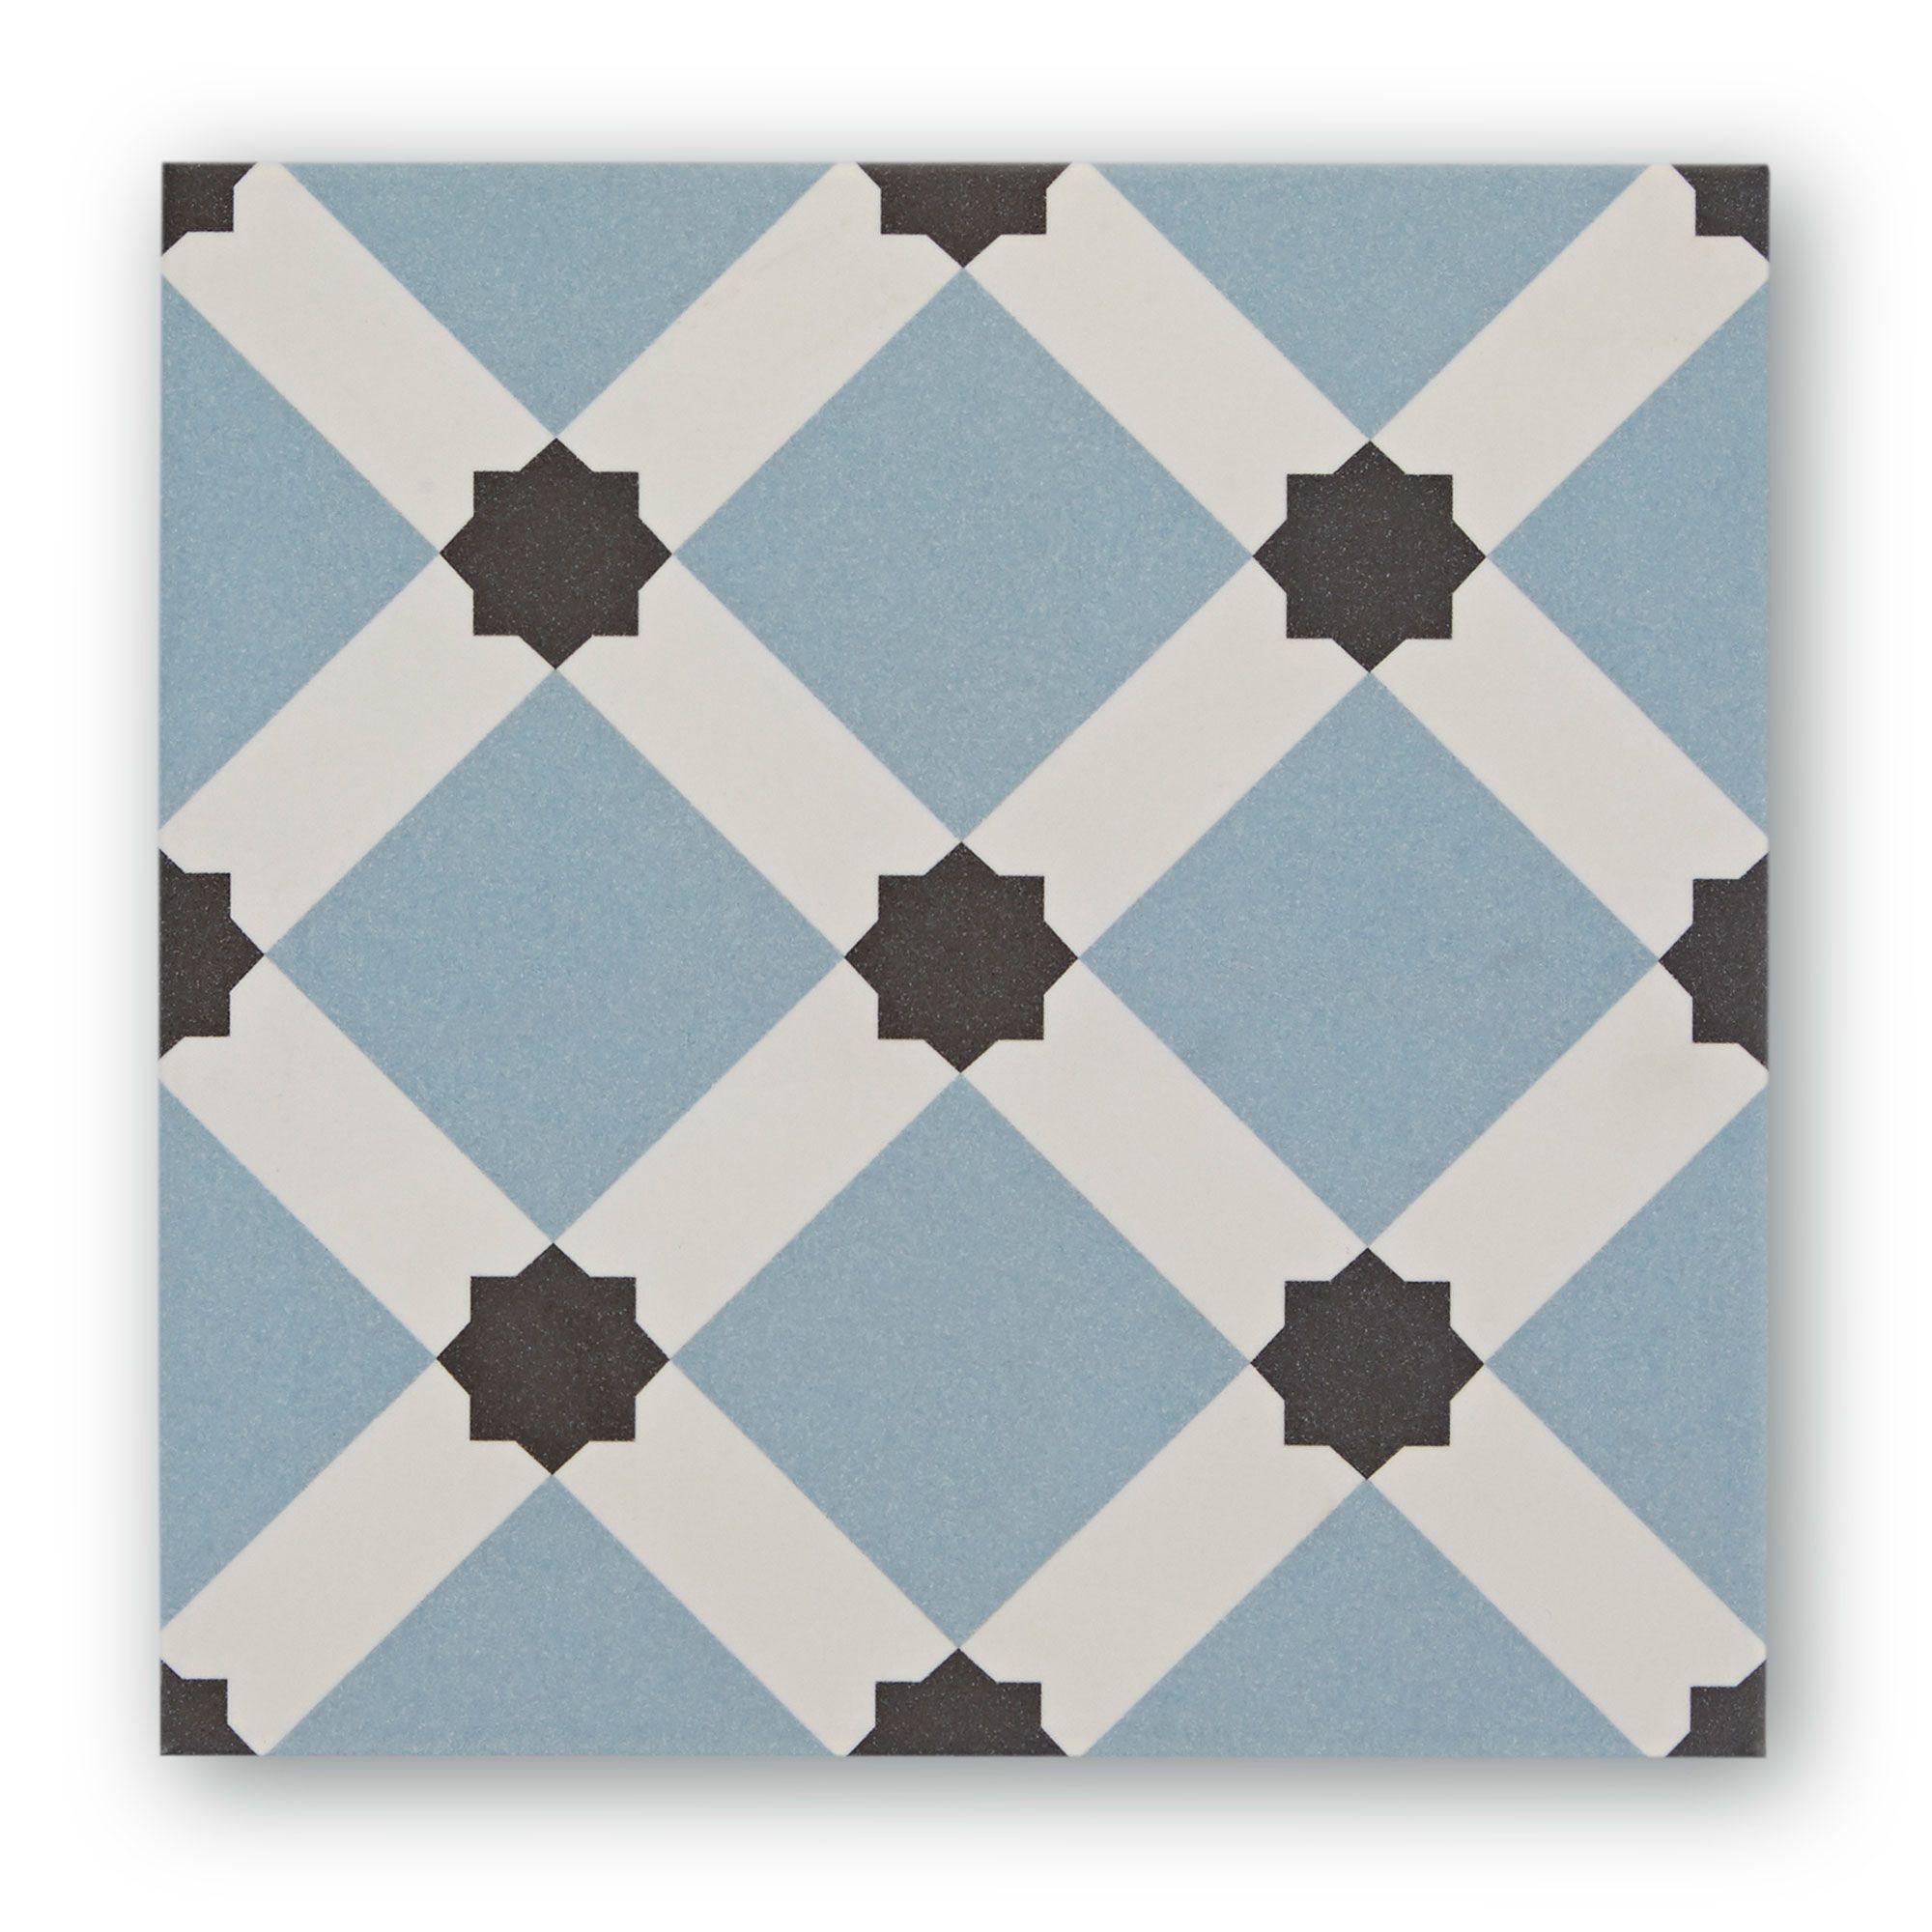 Patisserie Hevin Kids Rugs Tiles Quilts